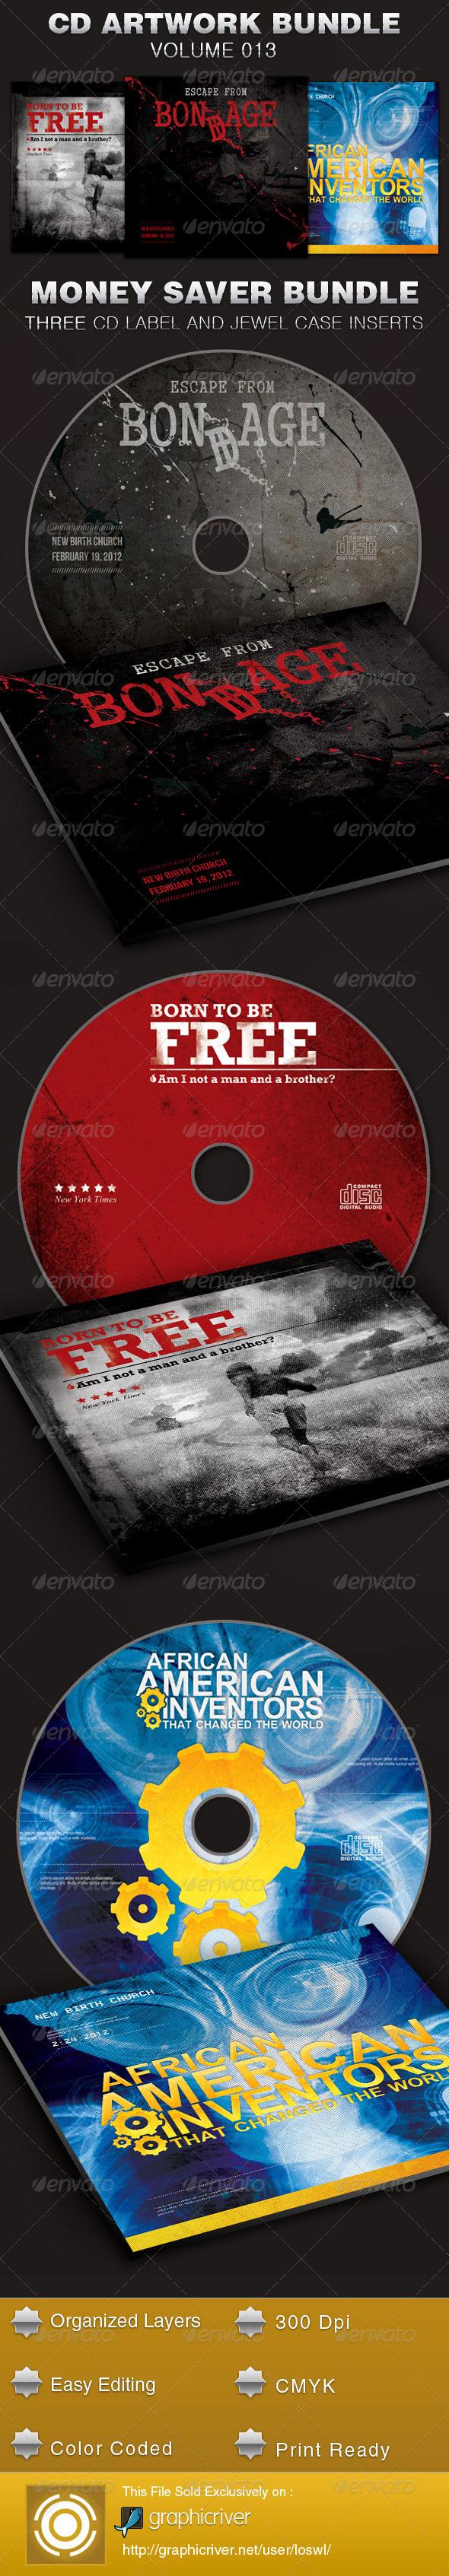 CD Cover Artwork Template Bundle-Vol 013 - CD & DVD Artwork Print Templates